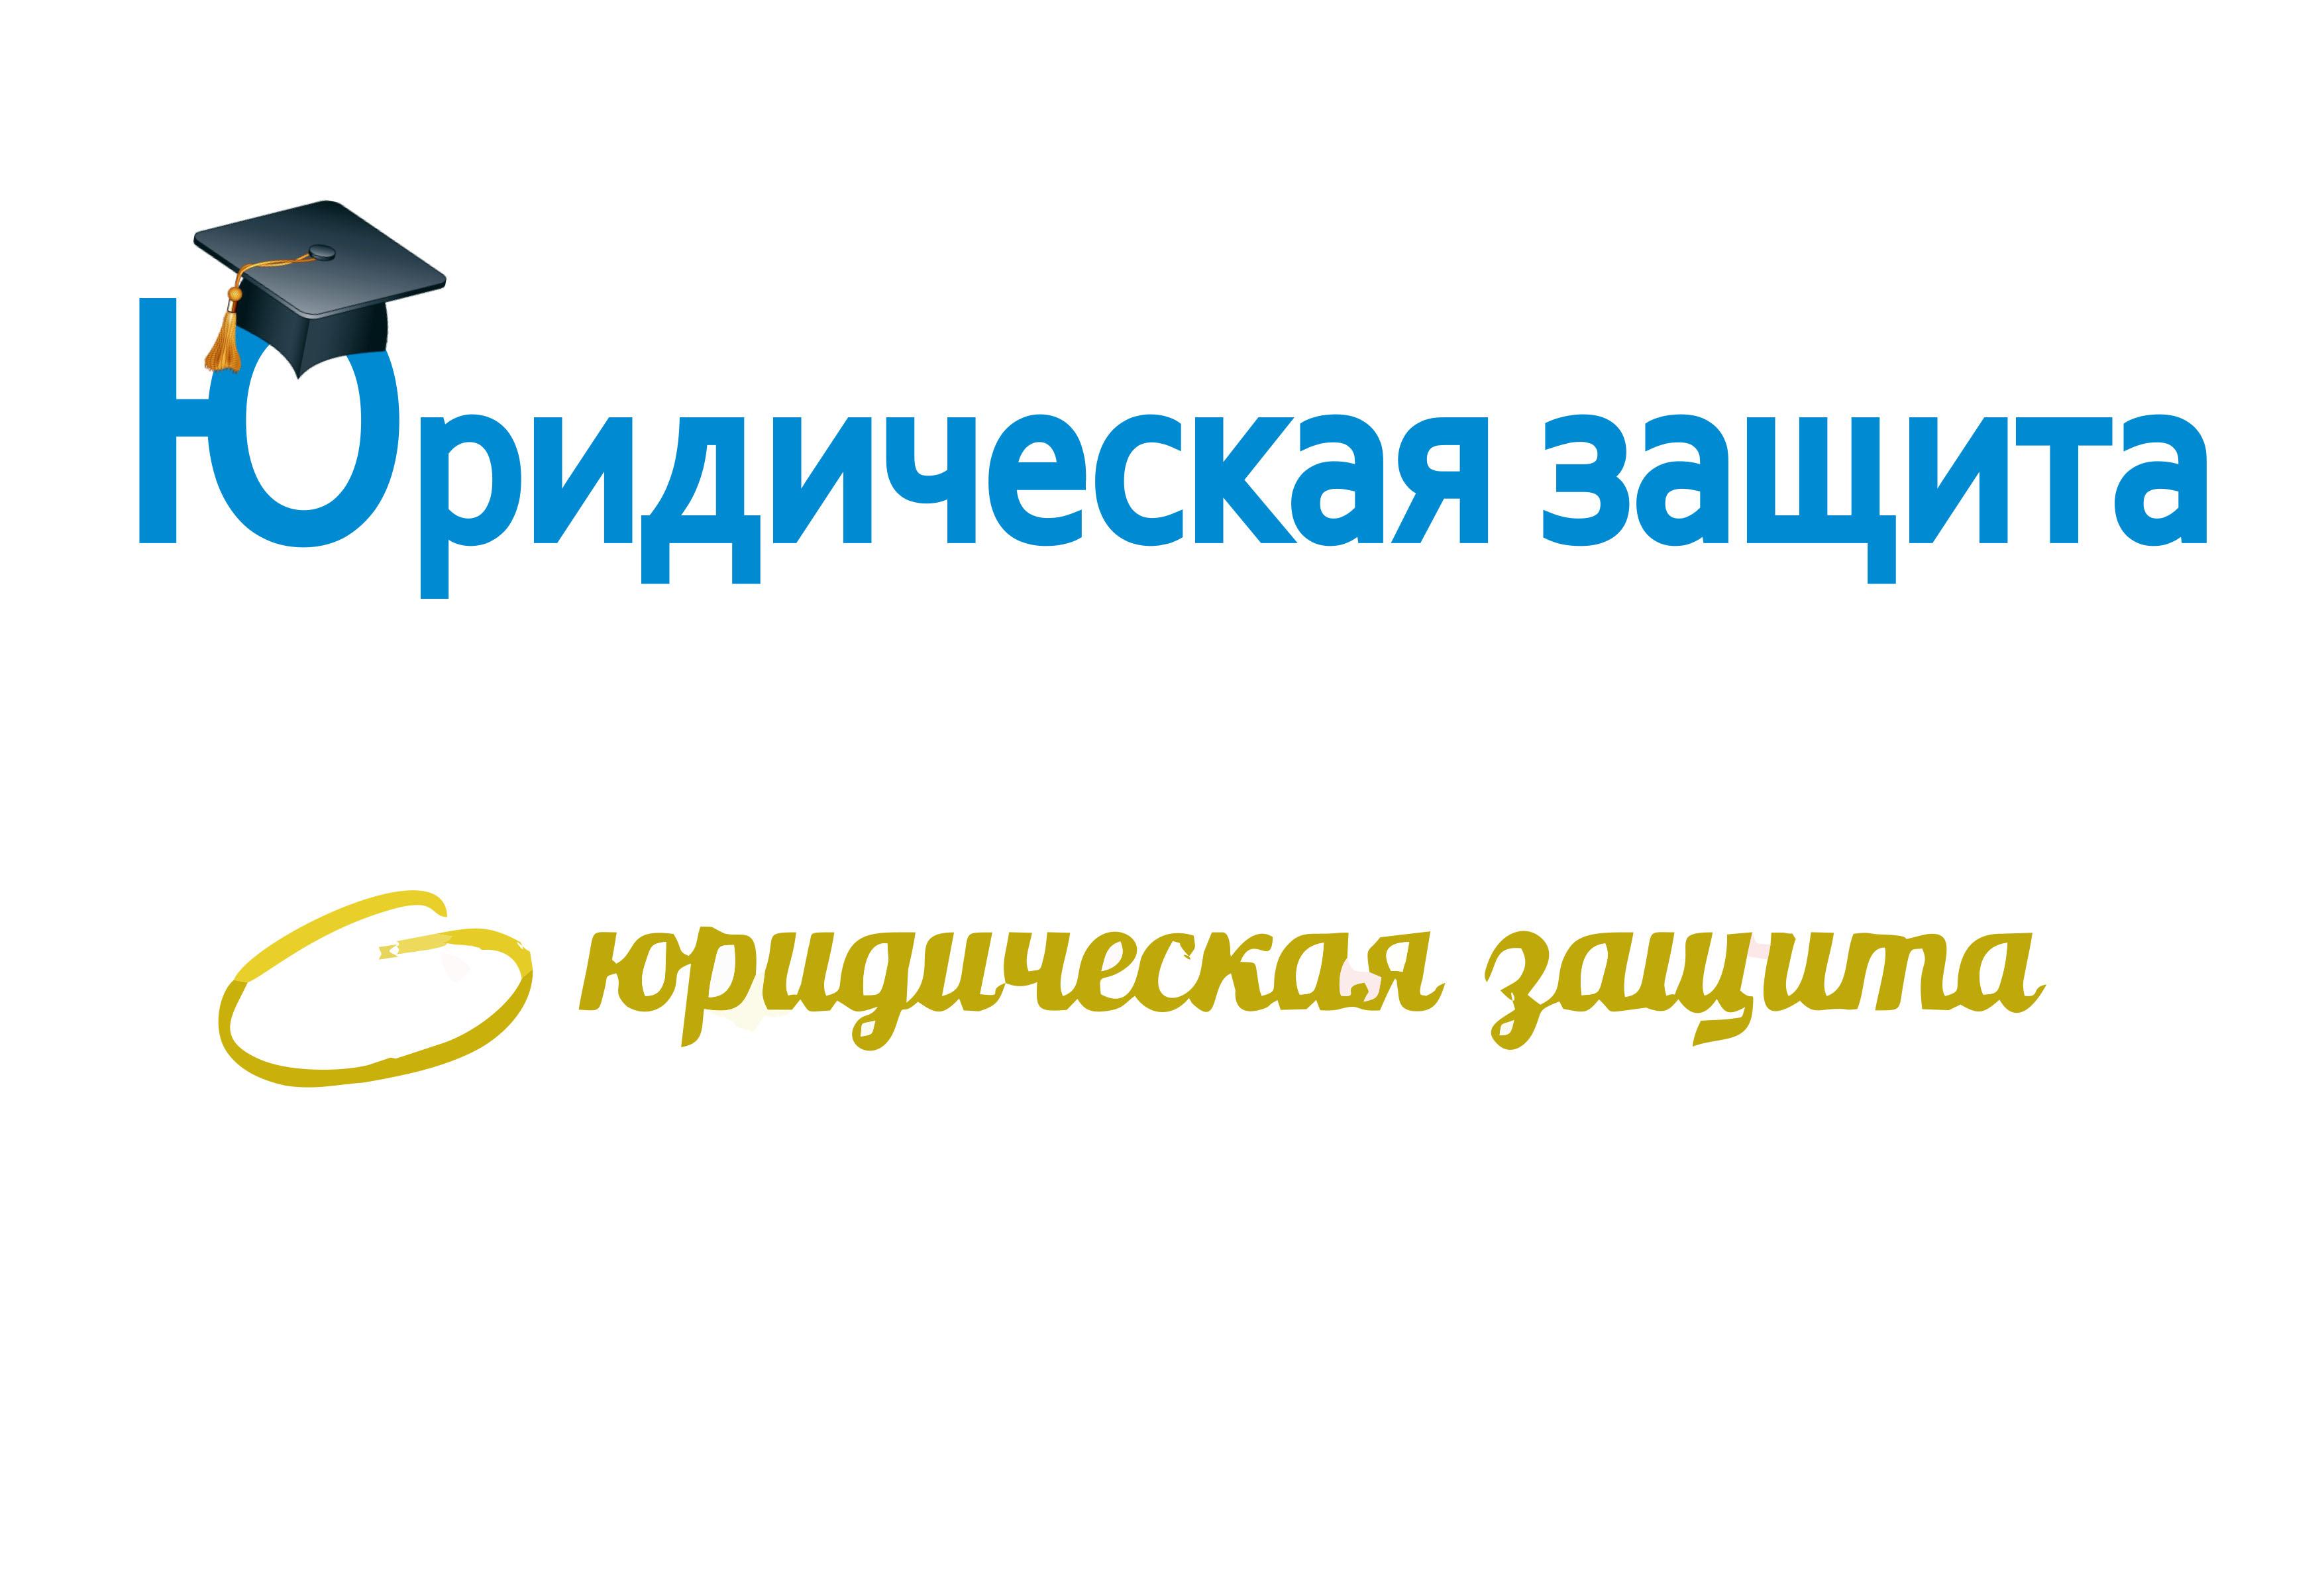 Разработка логотипа для юридической компании фото f_46855e15af031590.jpg